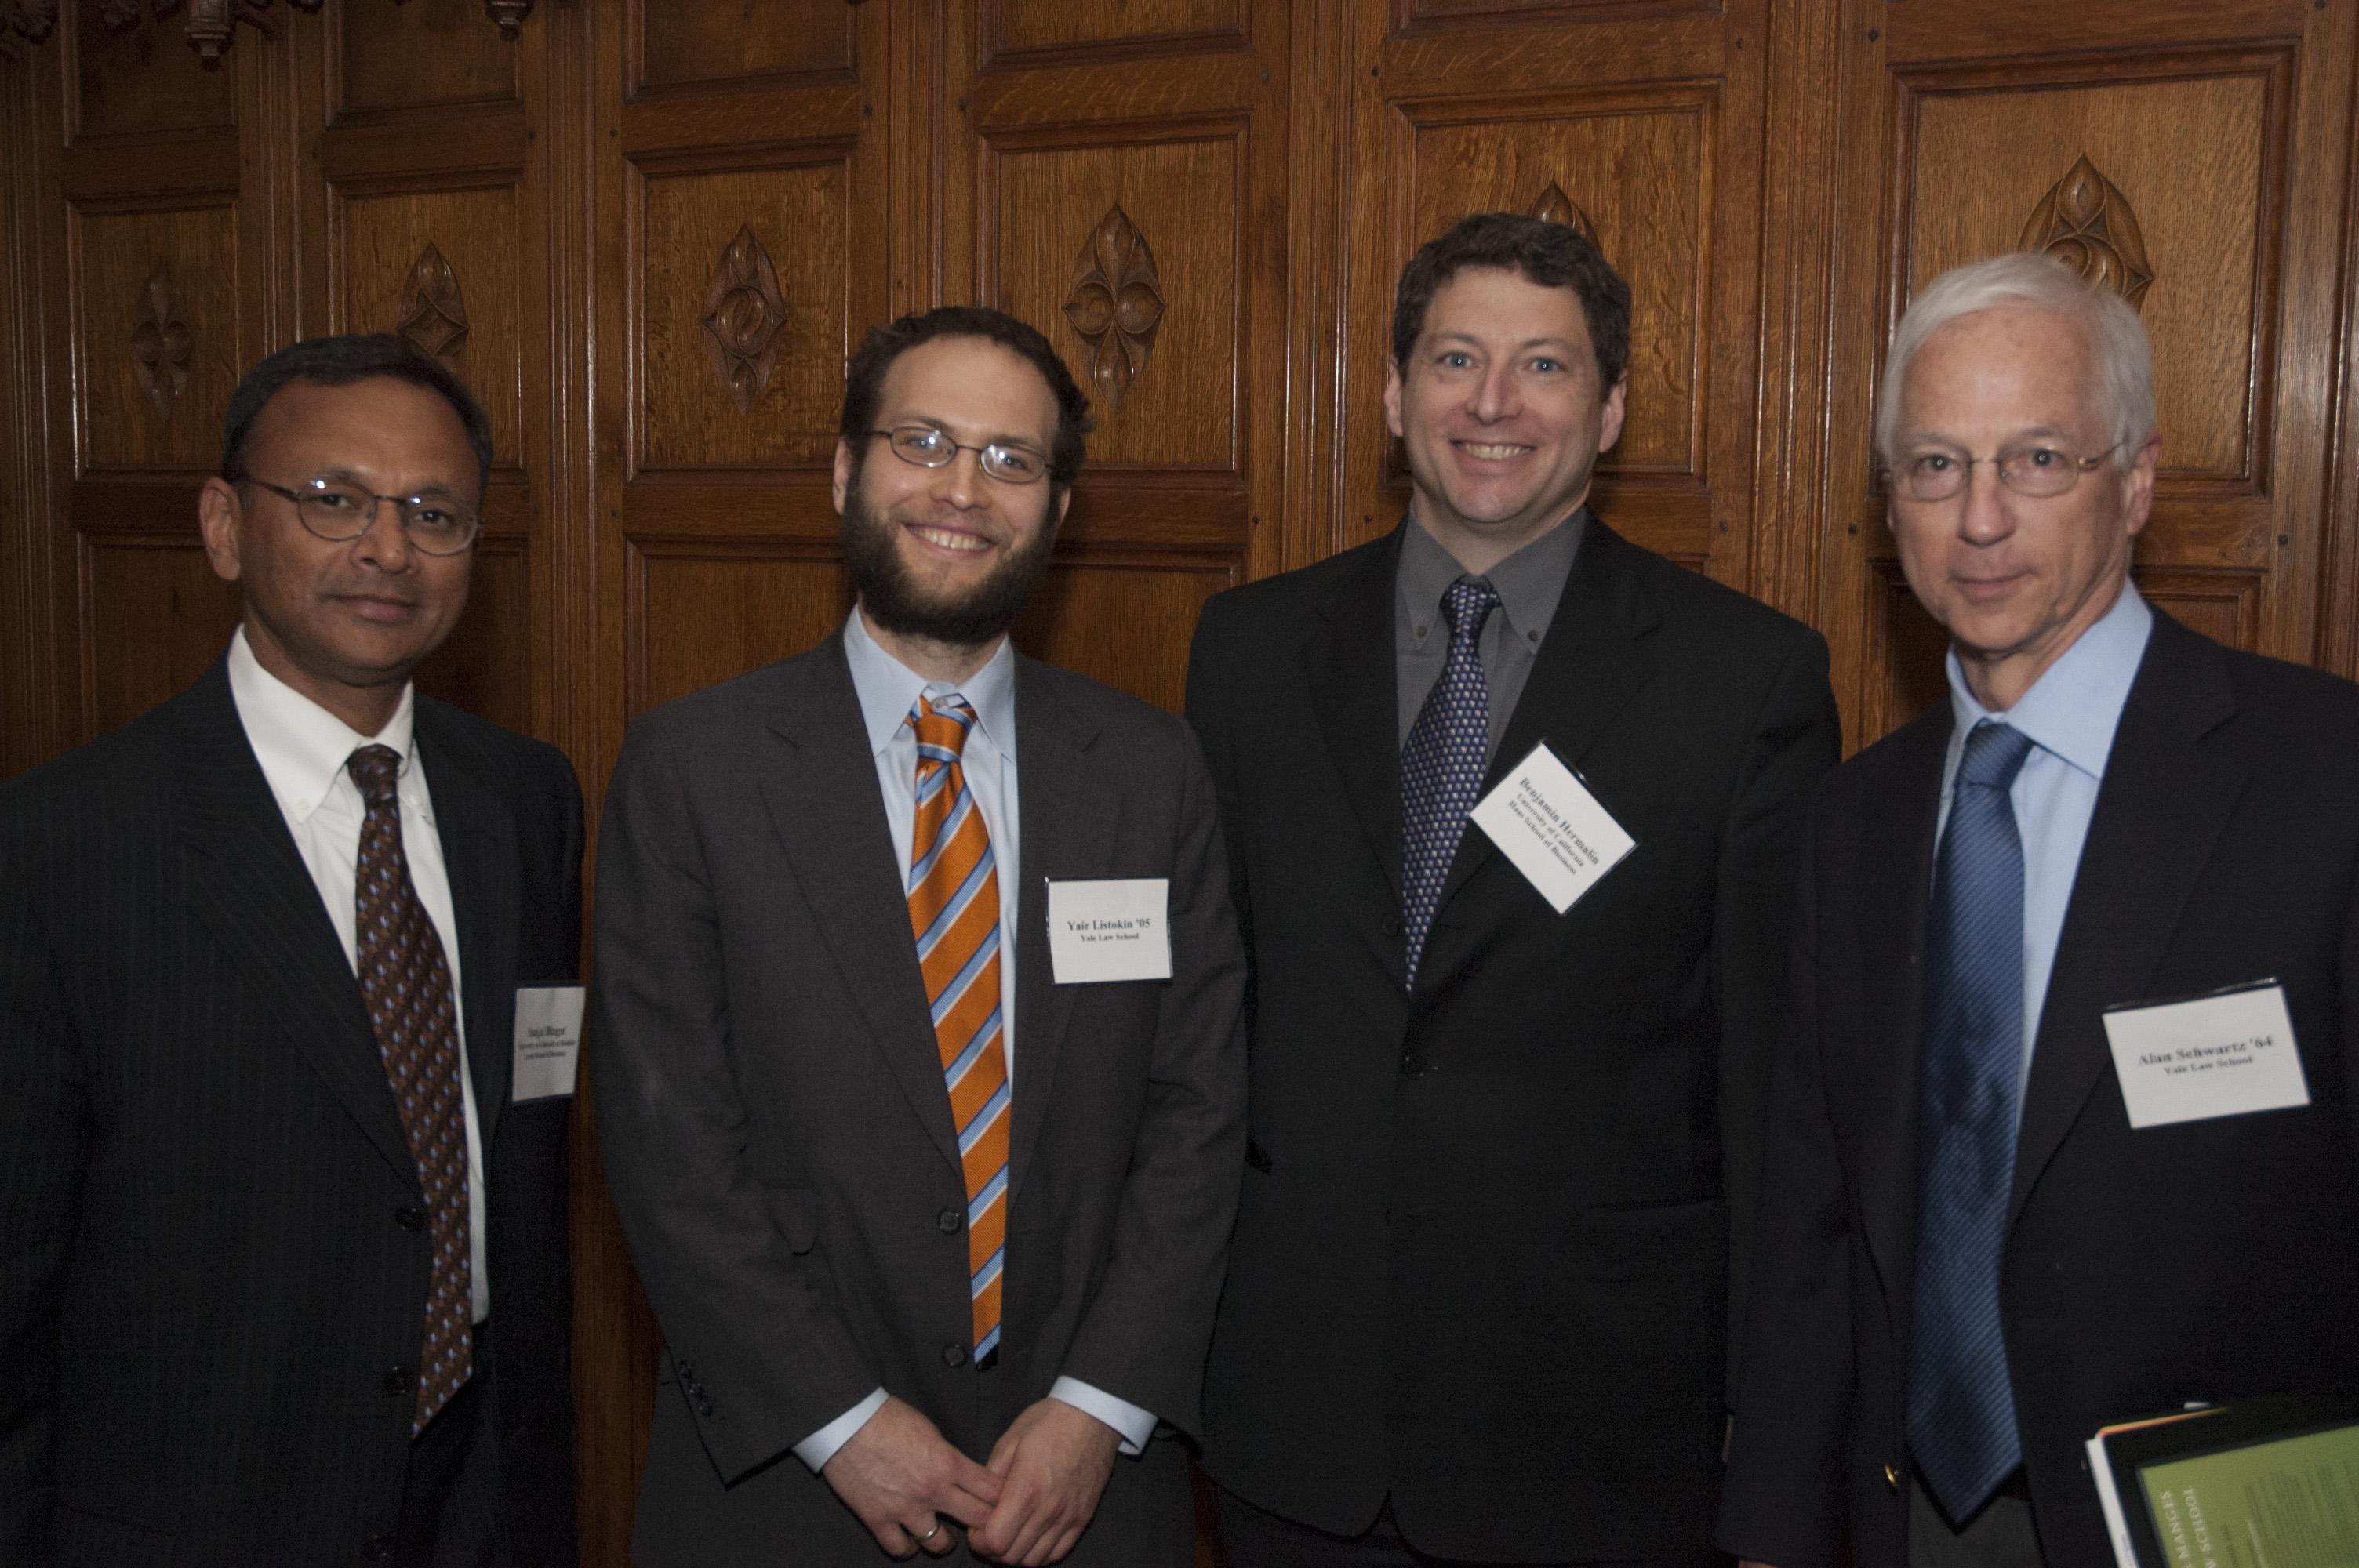 U. of Colorado Prof. Sanjai Bhagat, YLS Prof. Yair Listokin '05, Berkeley Hass Prof. Benjamin Hermalin, and YLS Prof. Alan Schwartz '64